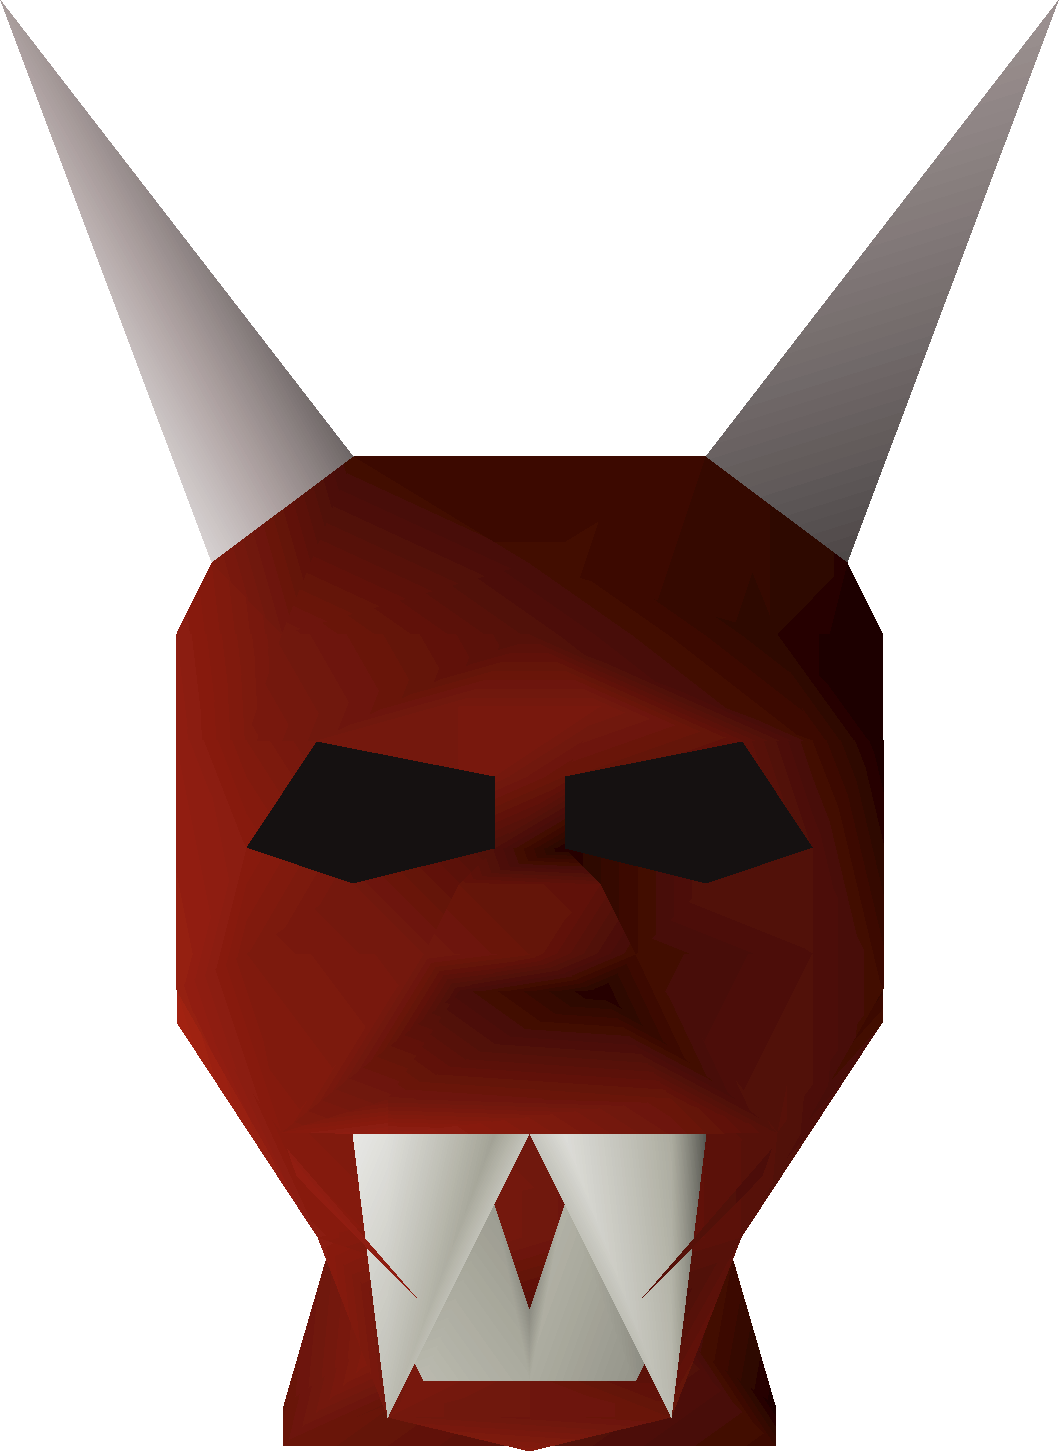 Rare Halloween Item 2020 Osrs Red halloween mask   OSRS Wiki